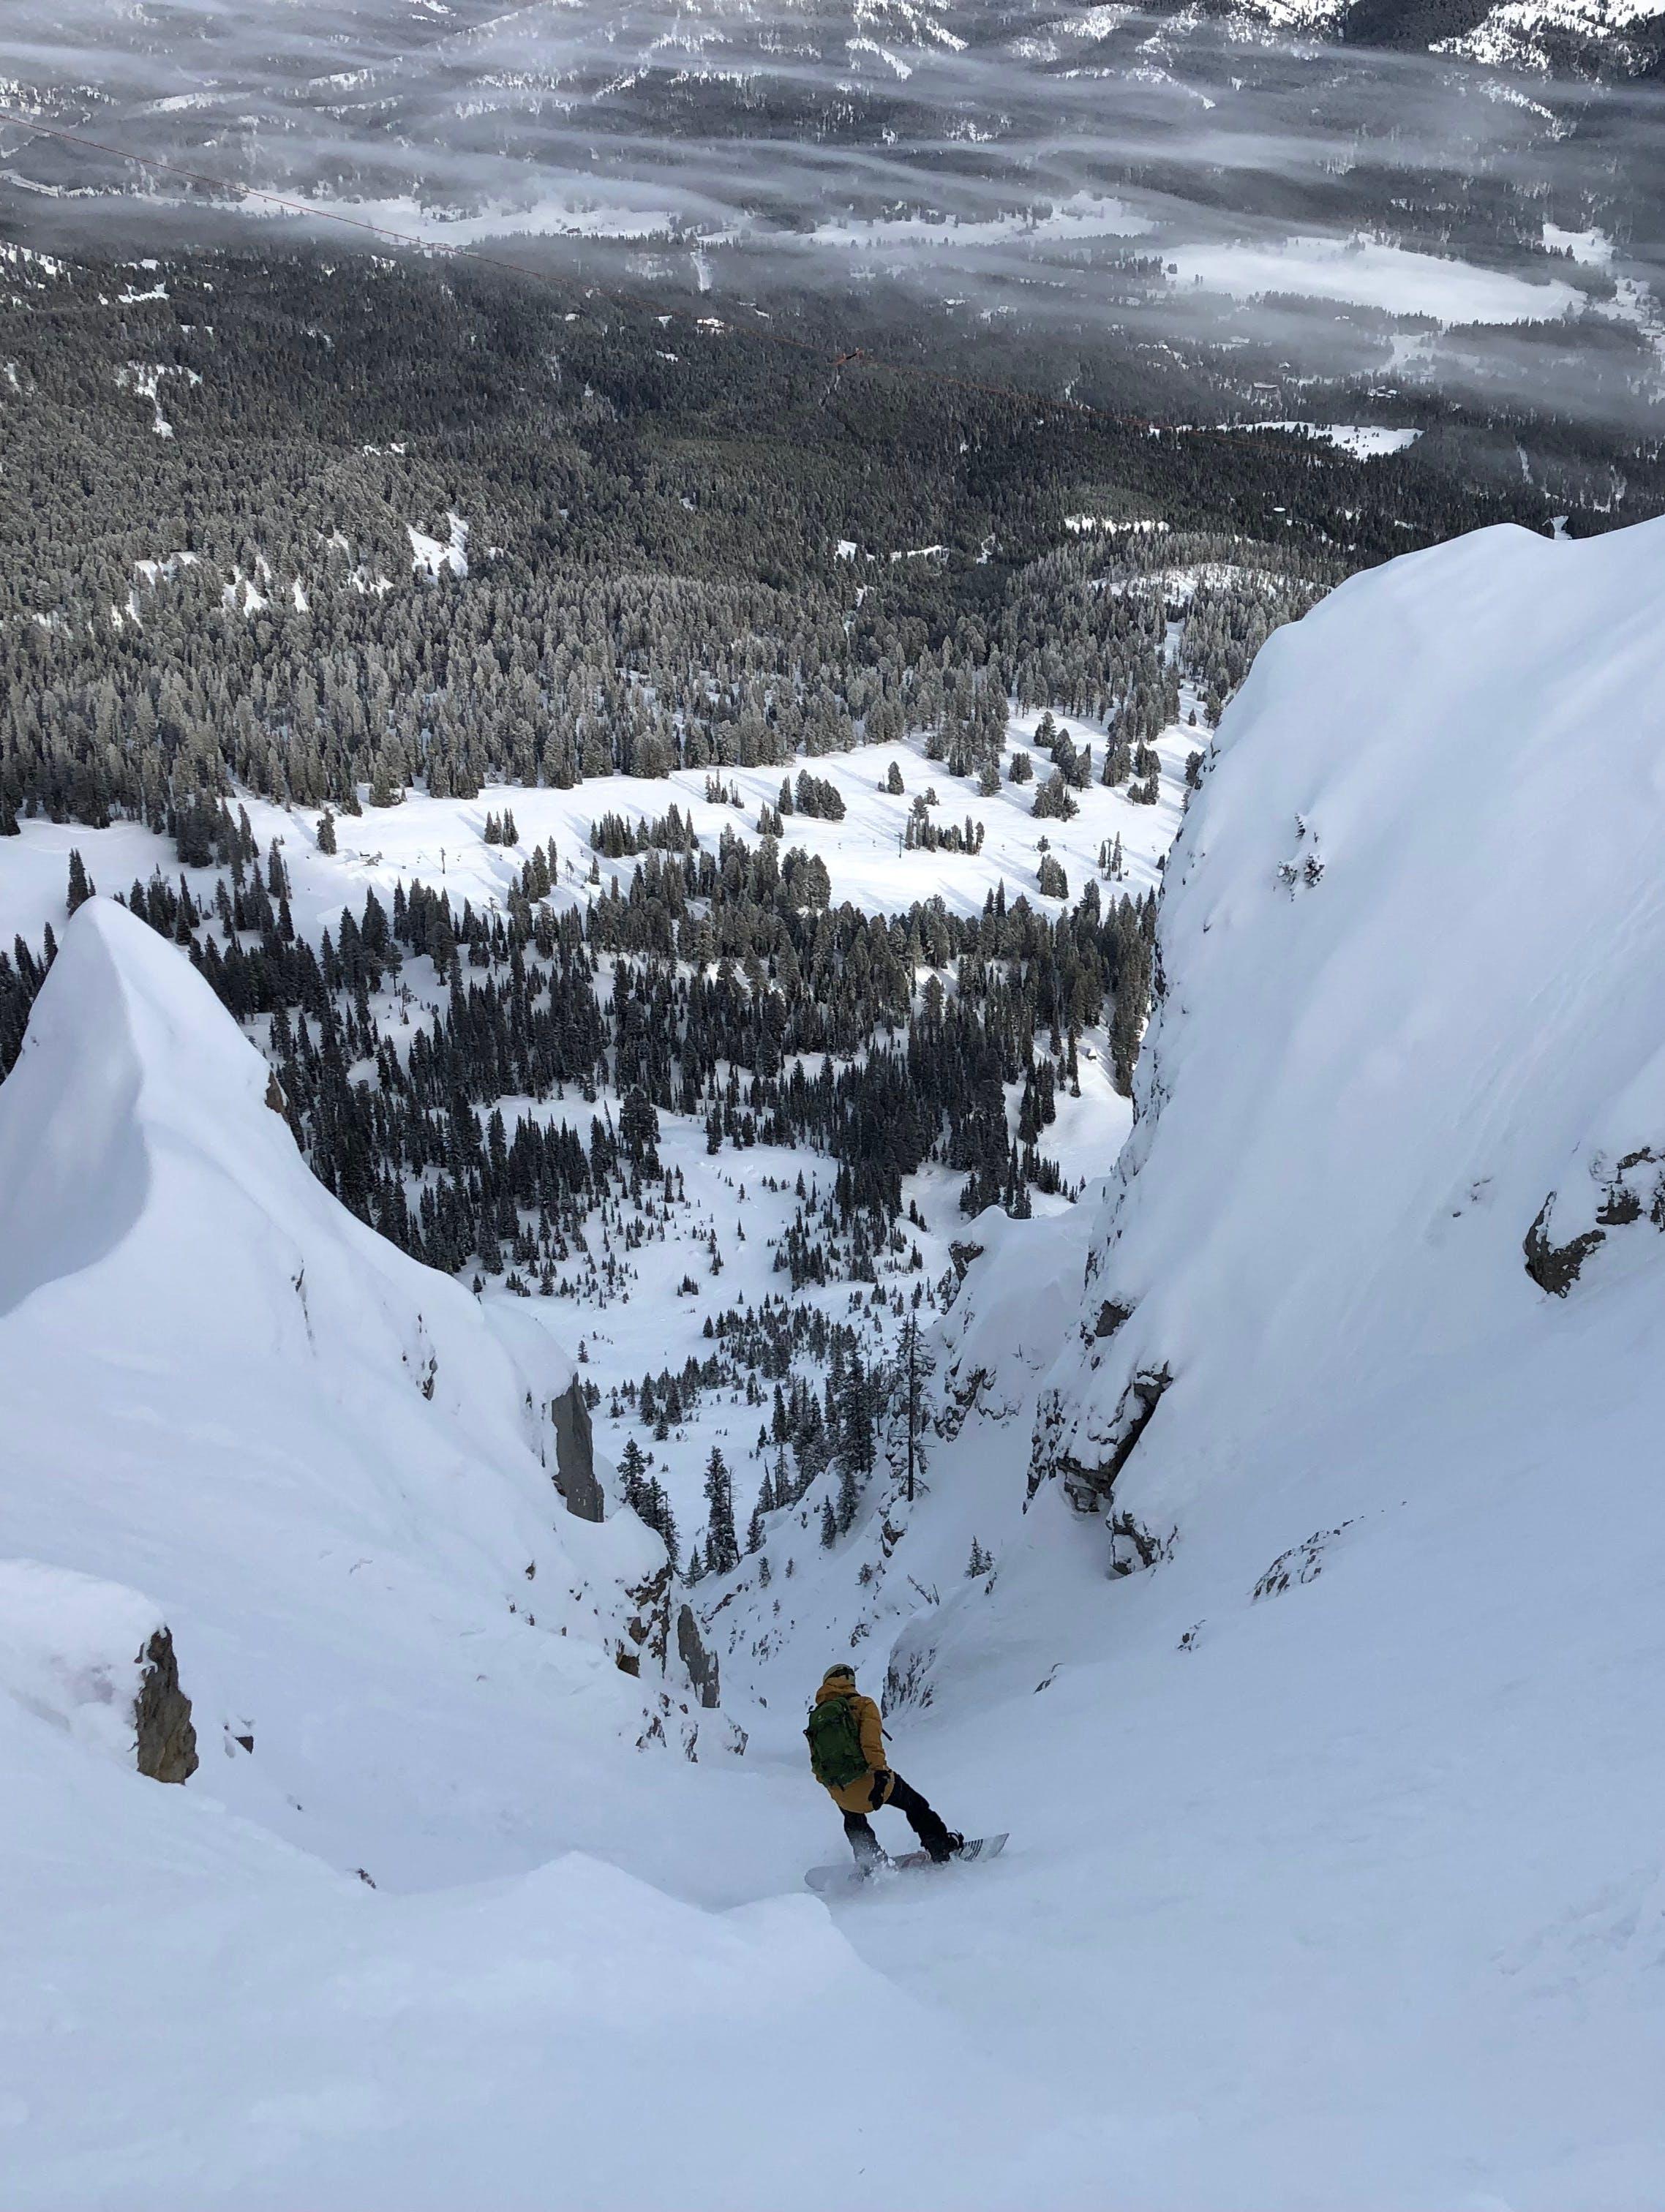 Winter Sports Expert Fabio Domenig